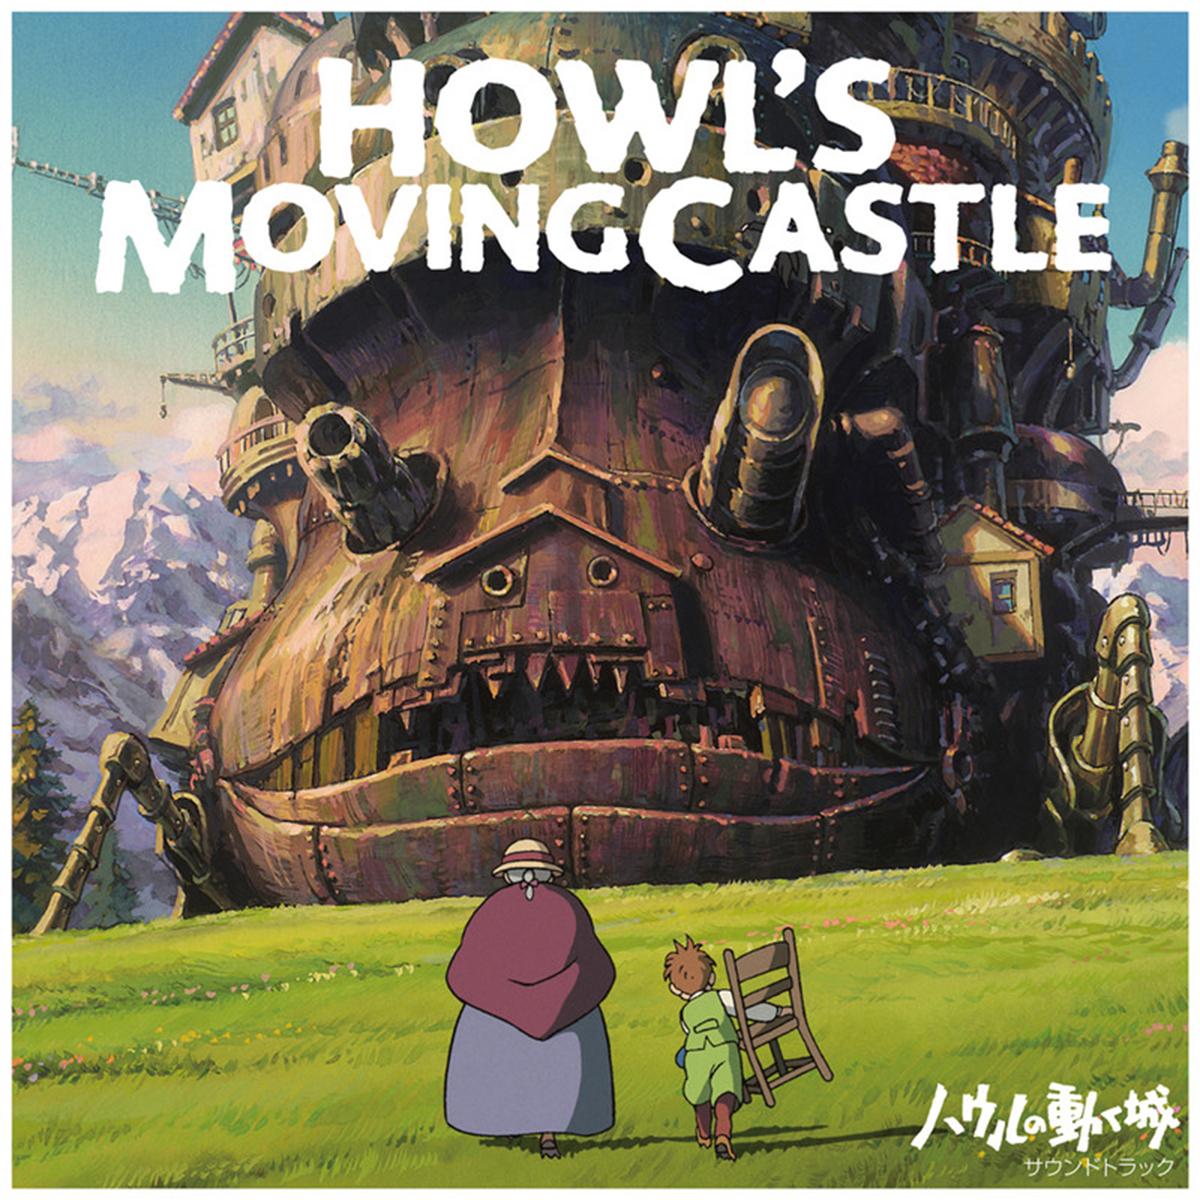 Howl's Moving Castle: Soundtrack